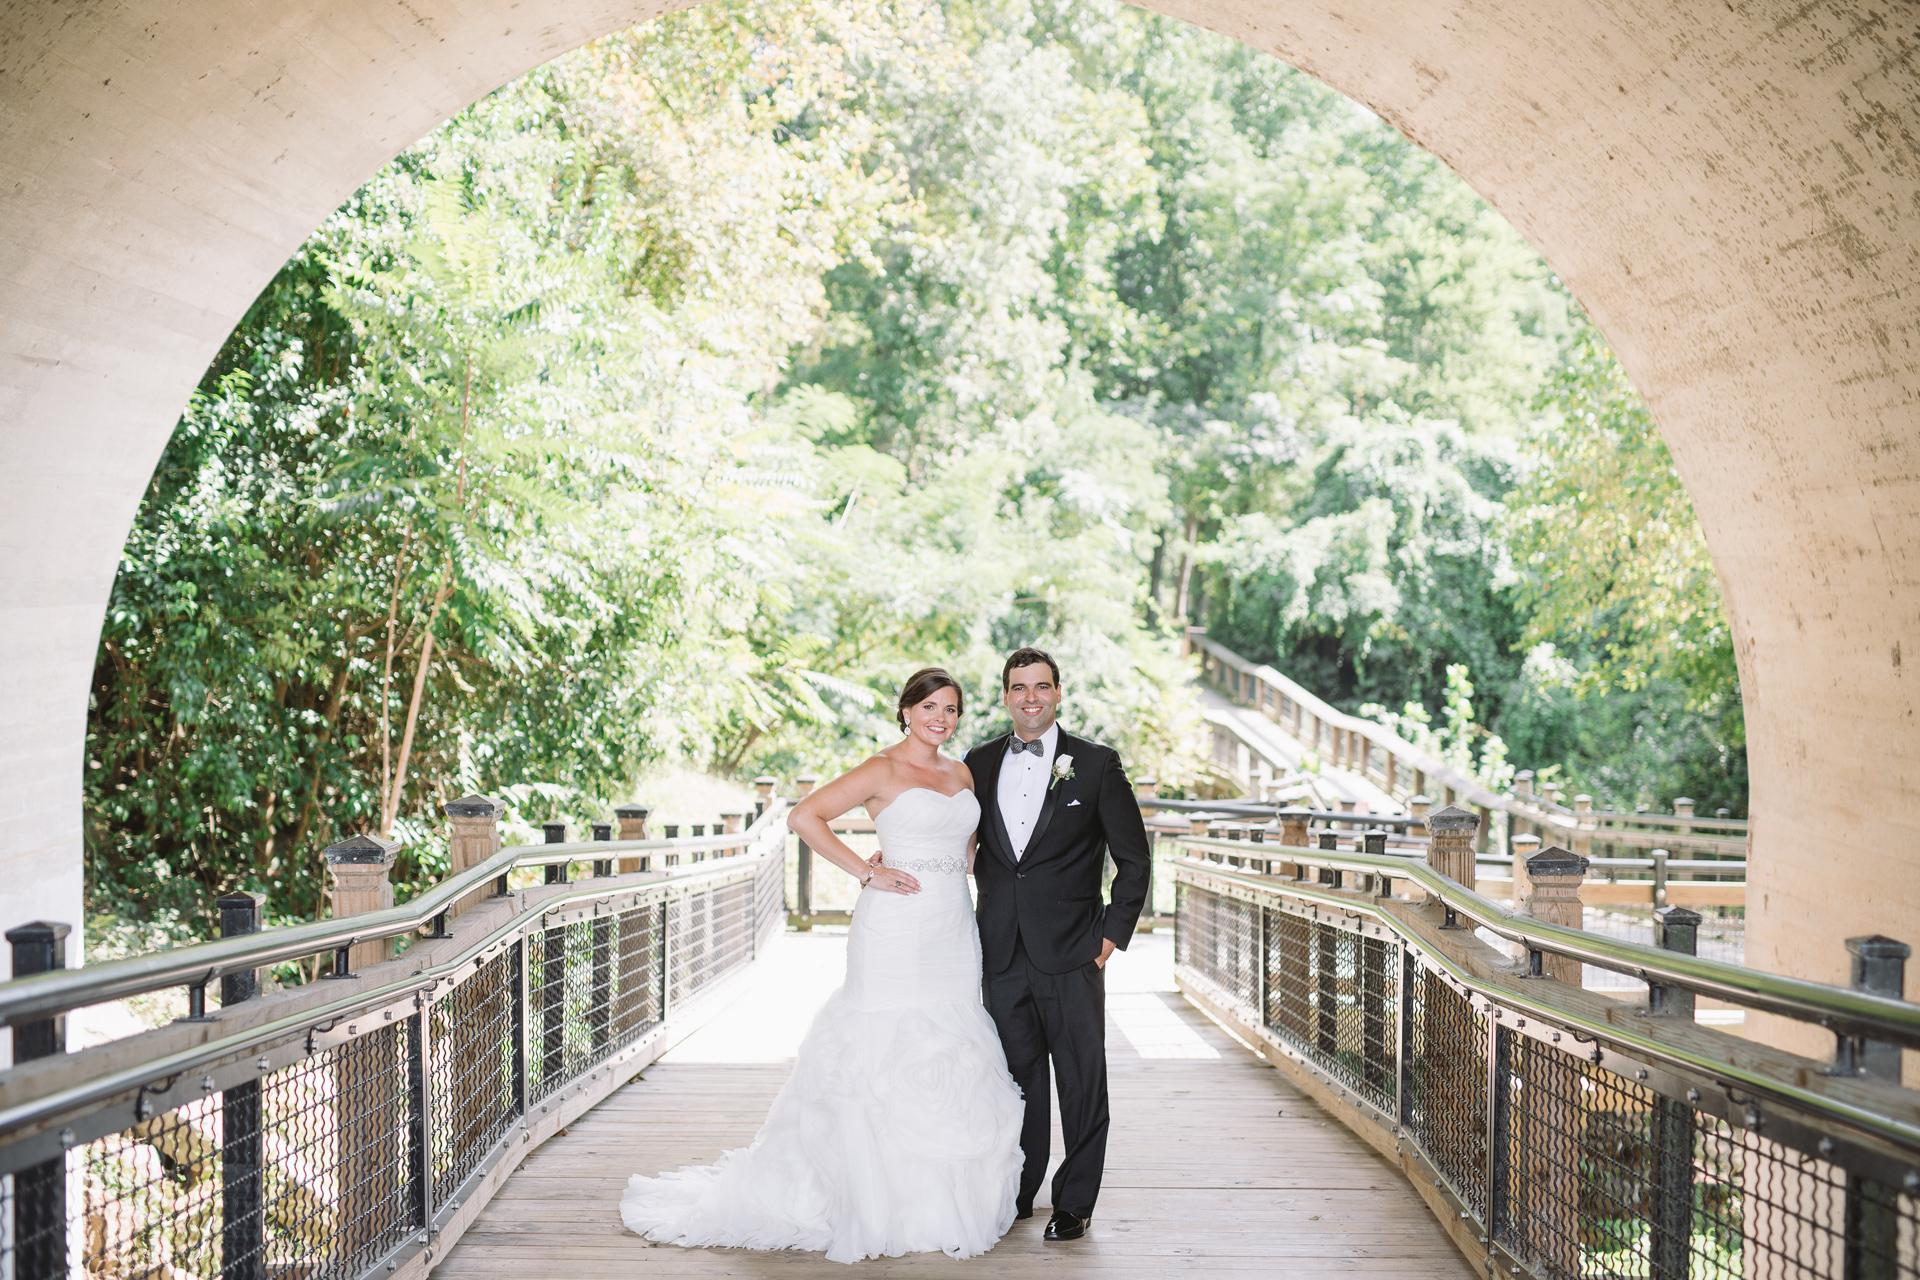 wedding portraits under the gervais street bridge